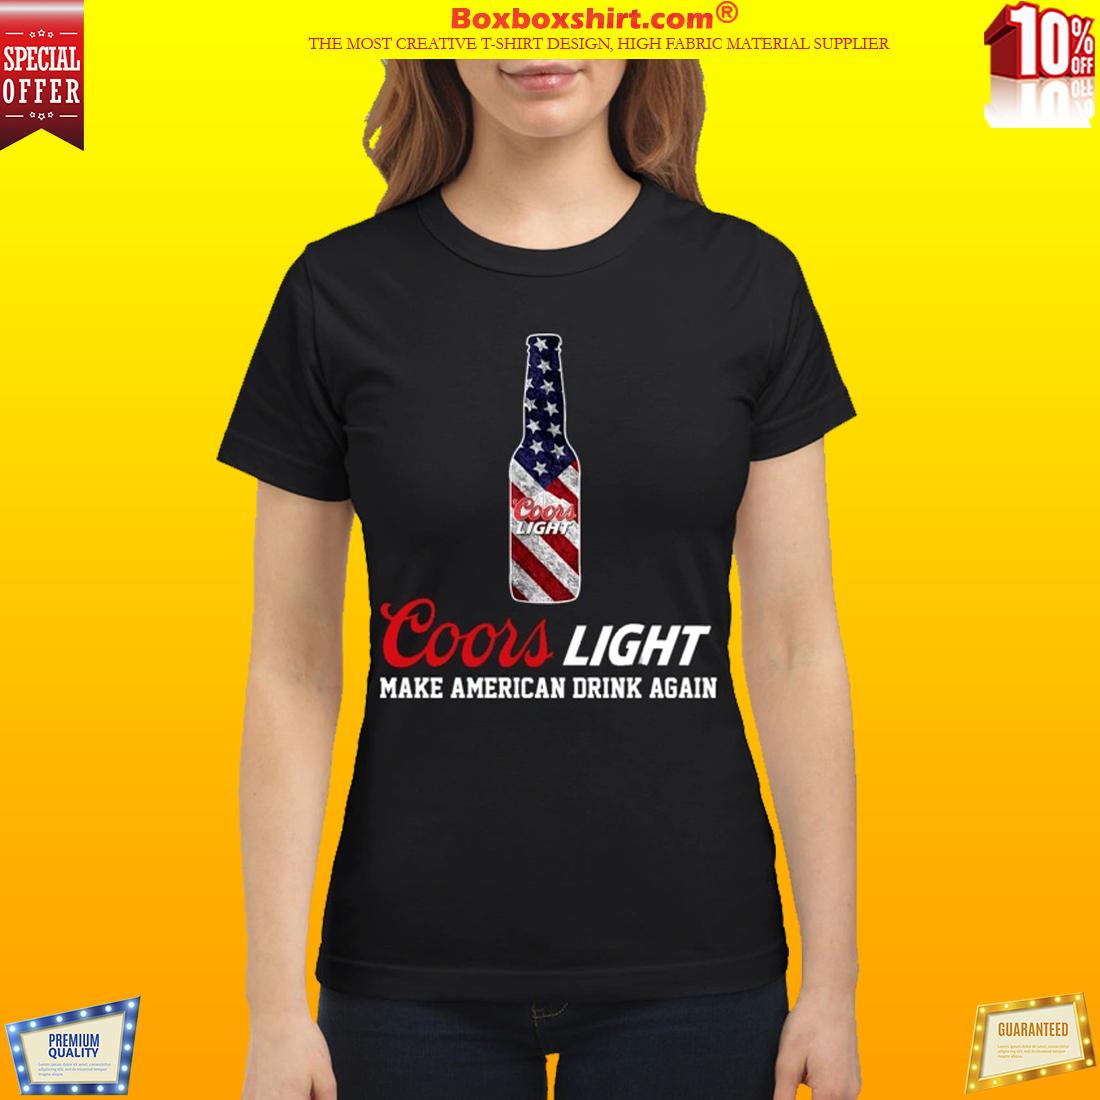 Coors light make American drink again classic shirt